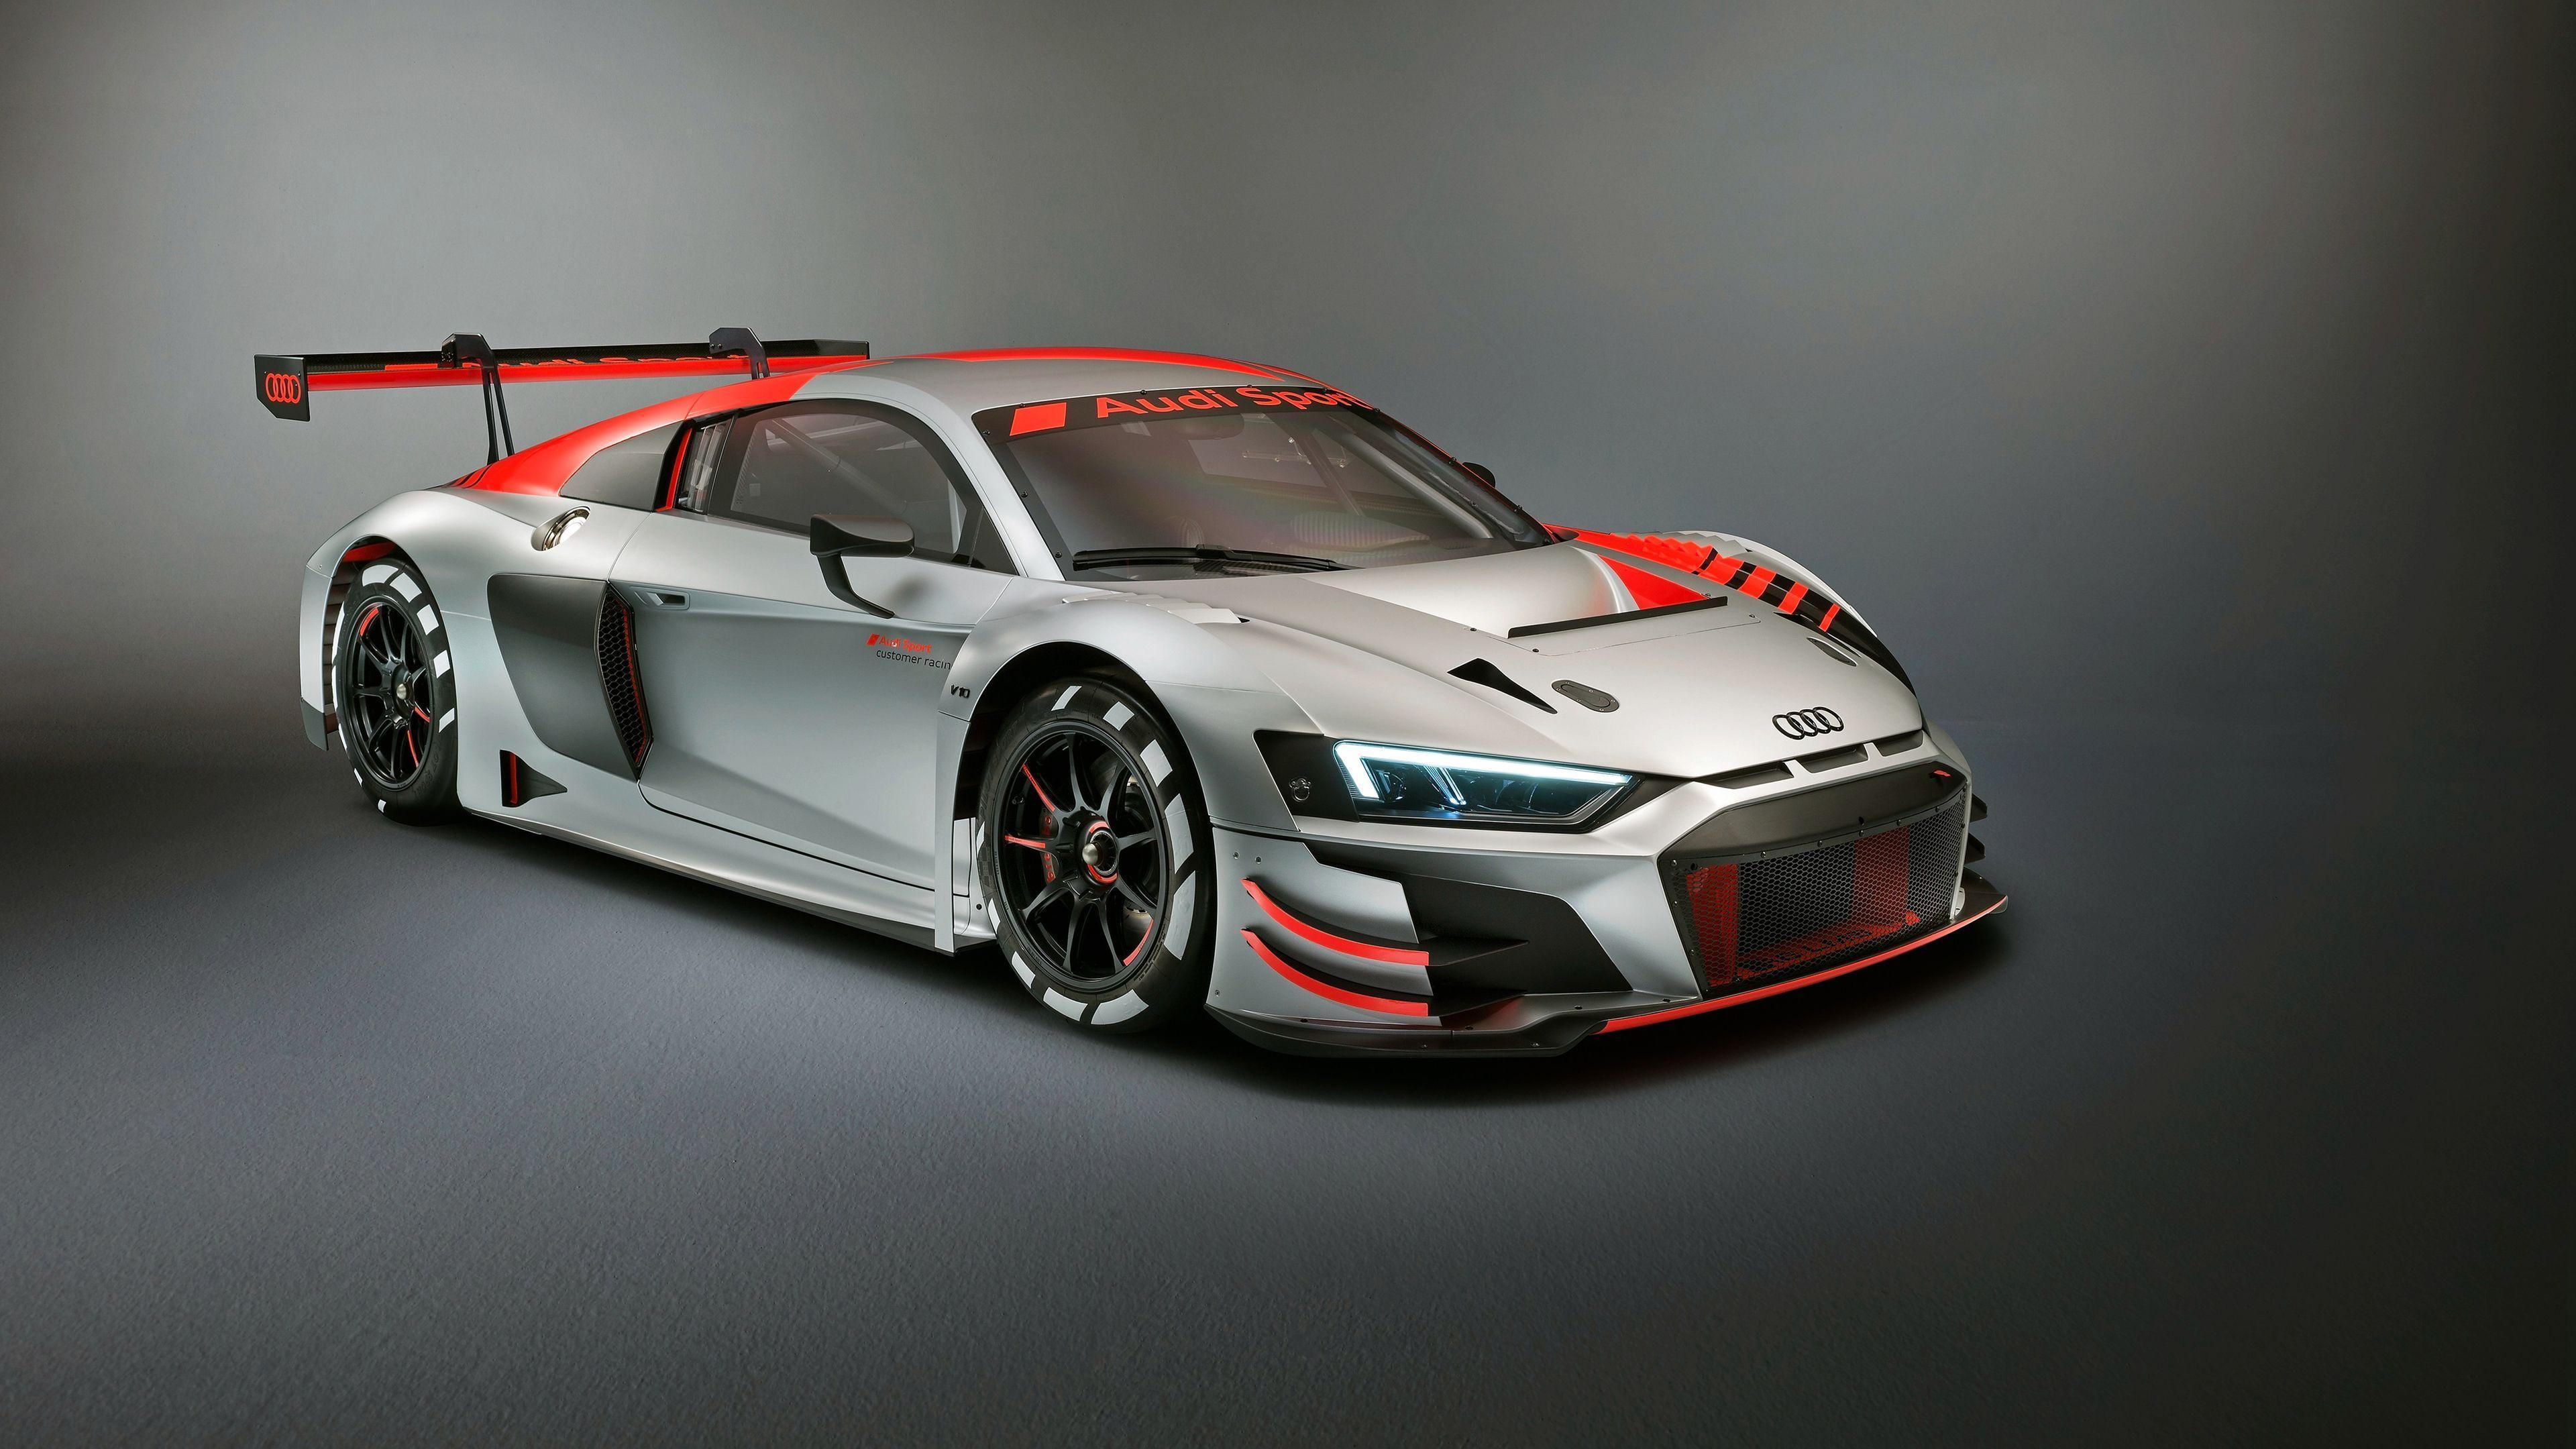 50 Audi R8 Lms Gt2 Sports Car Wallpapers On Wallpapersafari